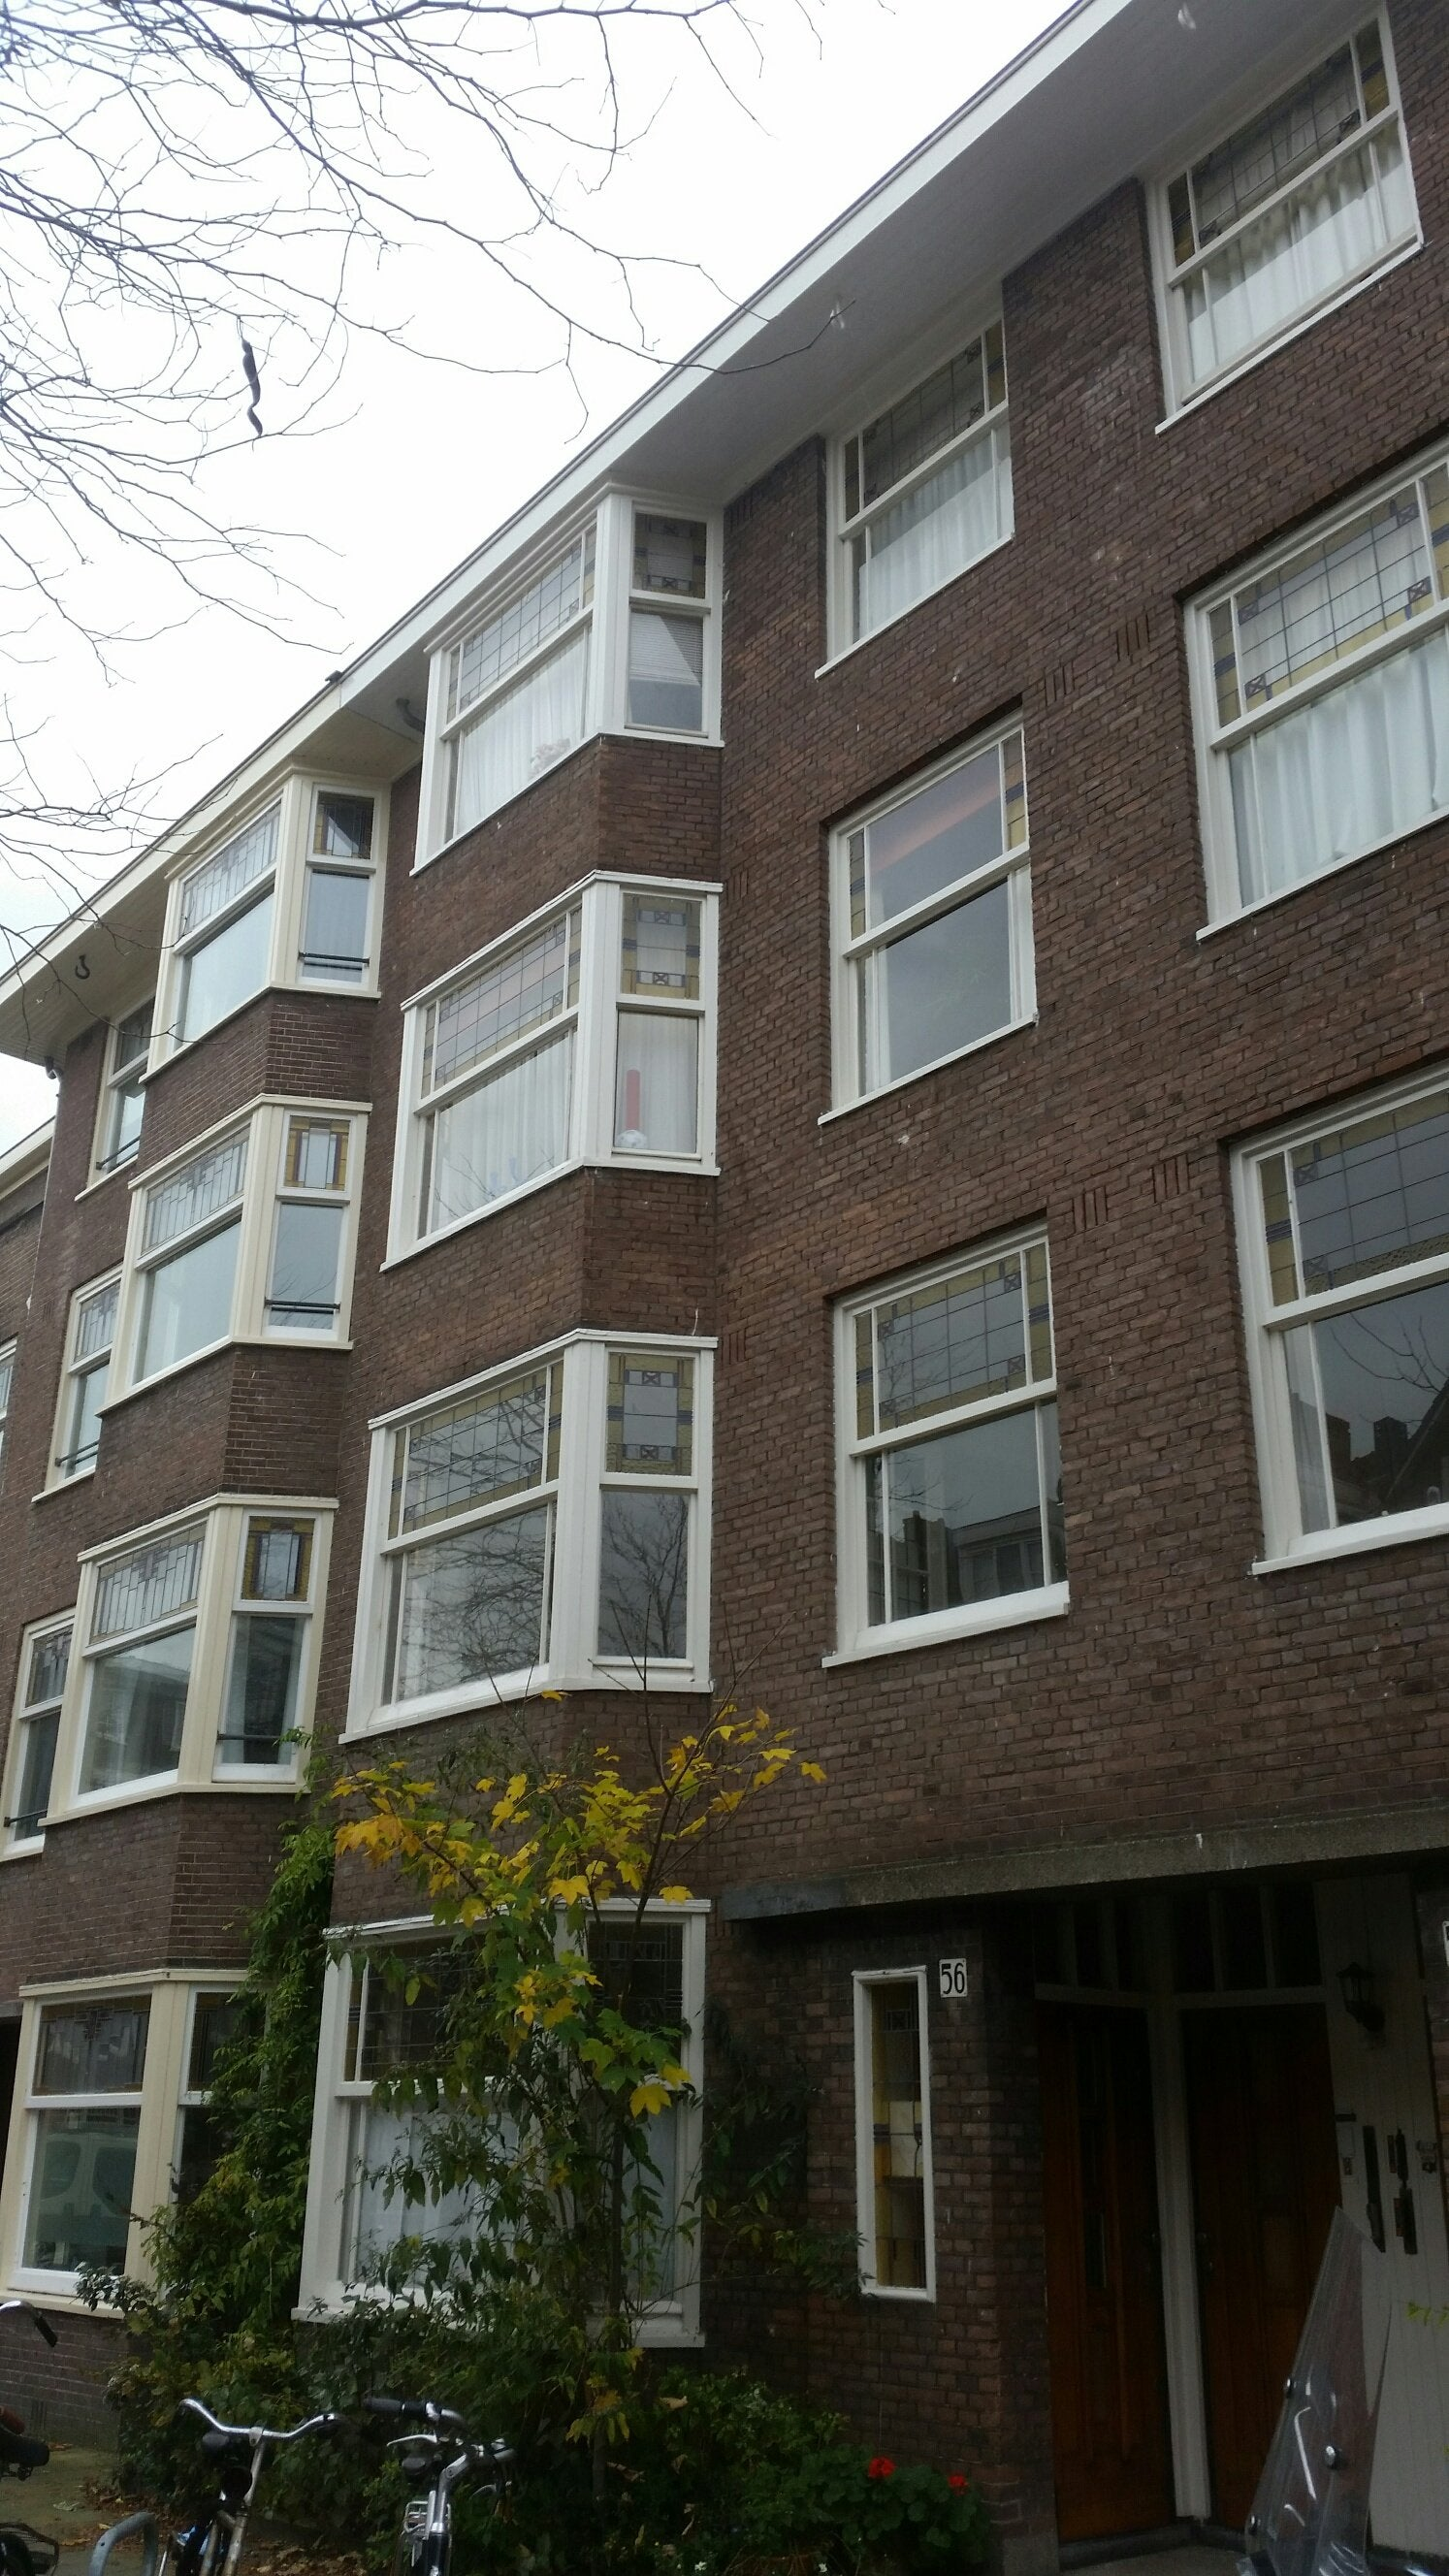 Amsterdam, Gaaspstraat